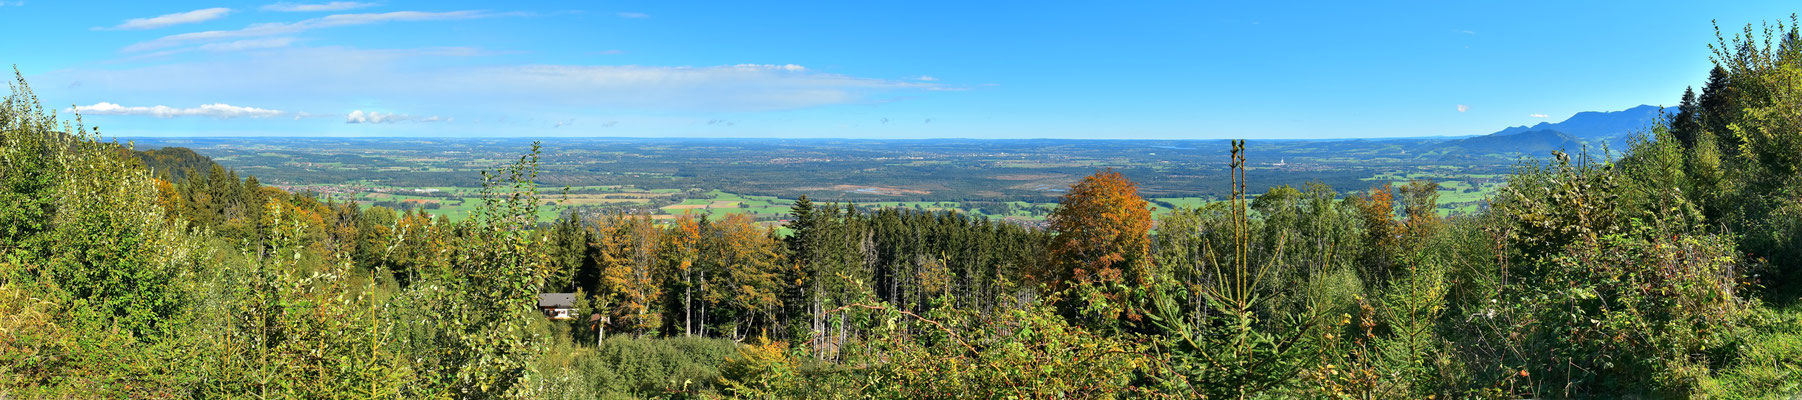 Panorama - Berge - Alpen - Wanderung - Chiemgau - Bad Feilnbach